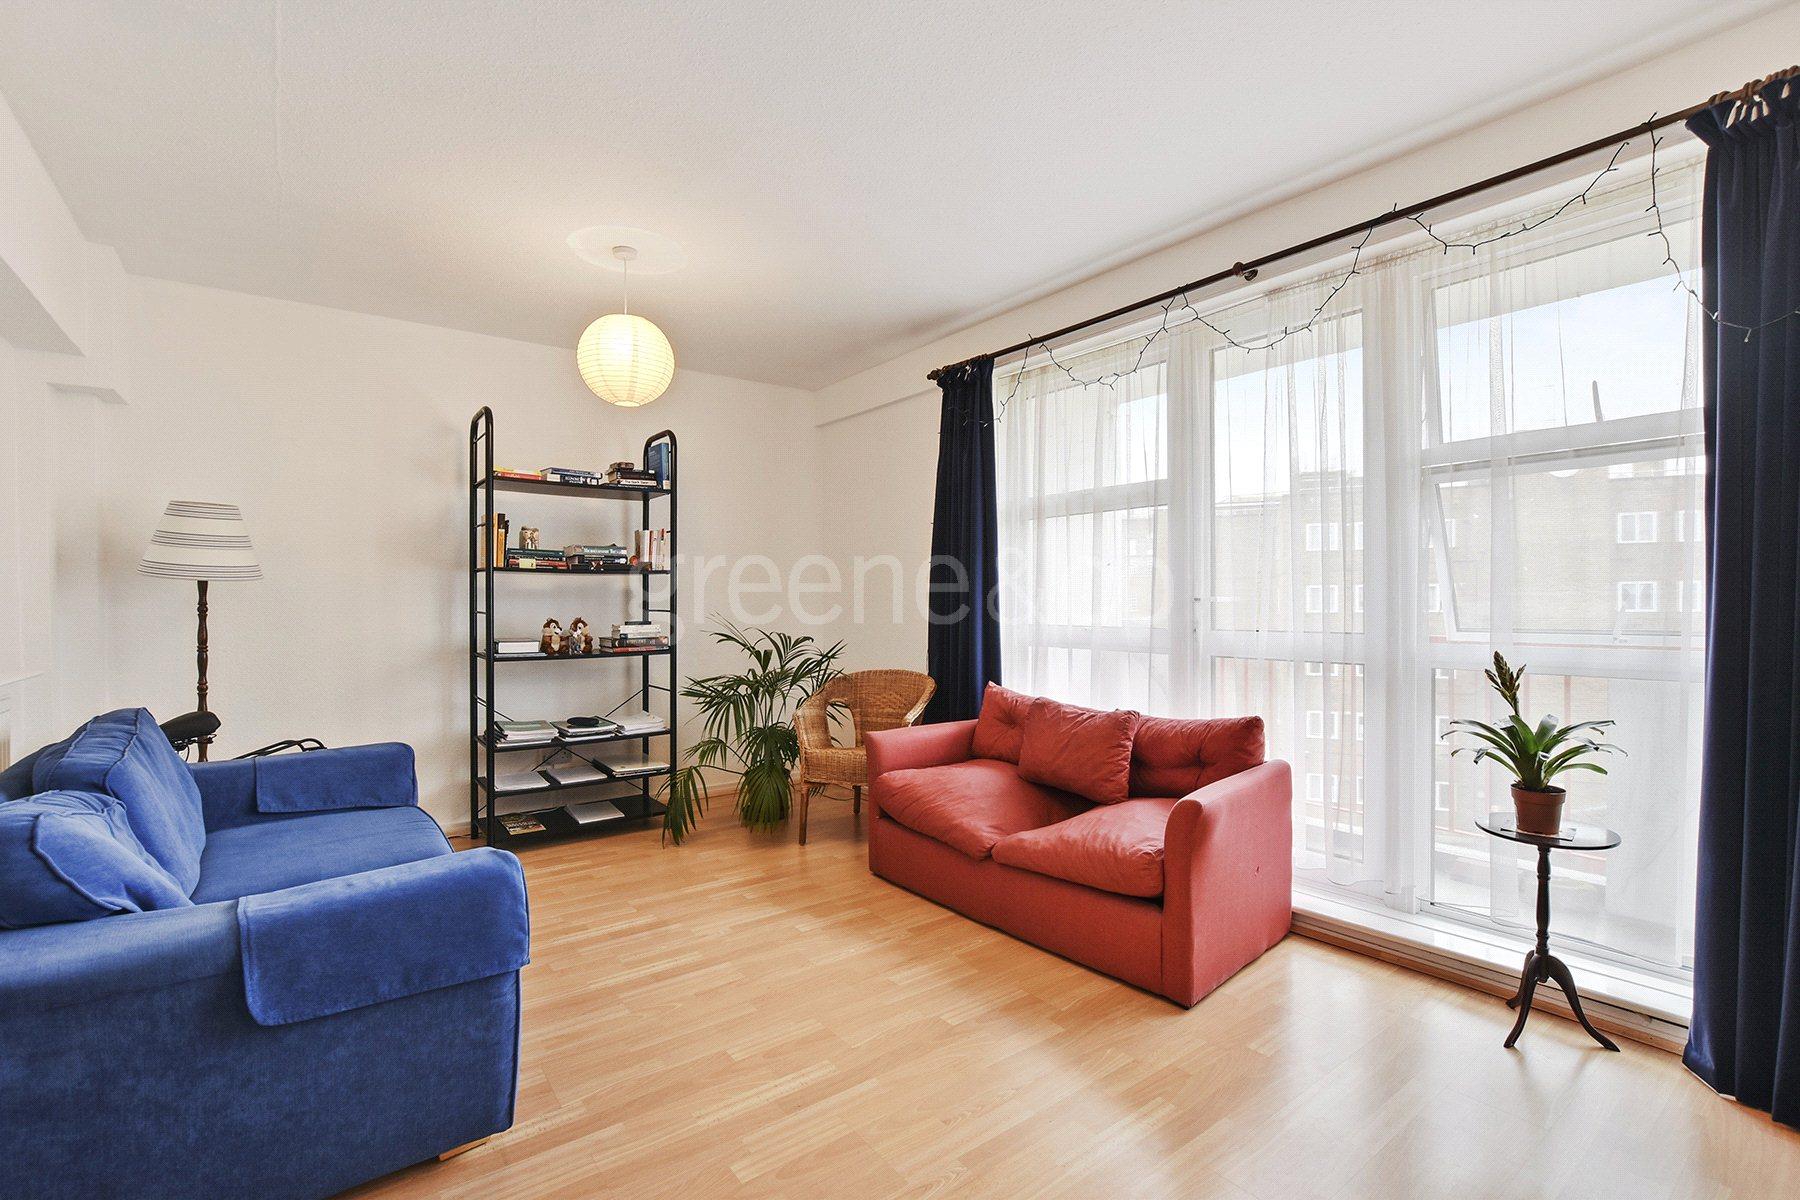 2 Bedrooms Flat for sale in Kilburn Gate, Kilburn Priory, London, NW6